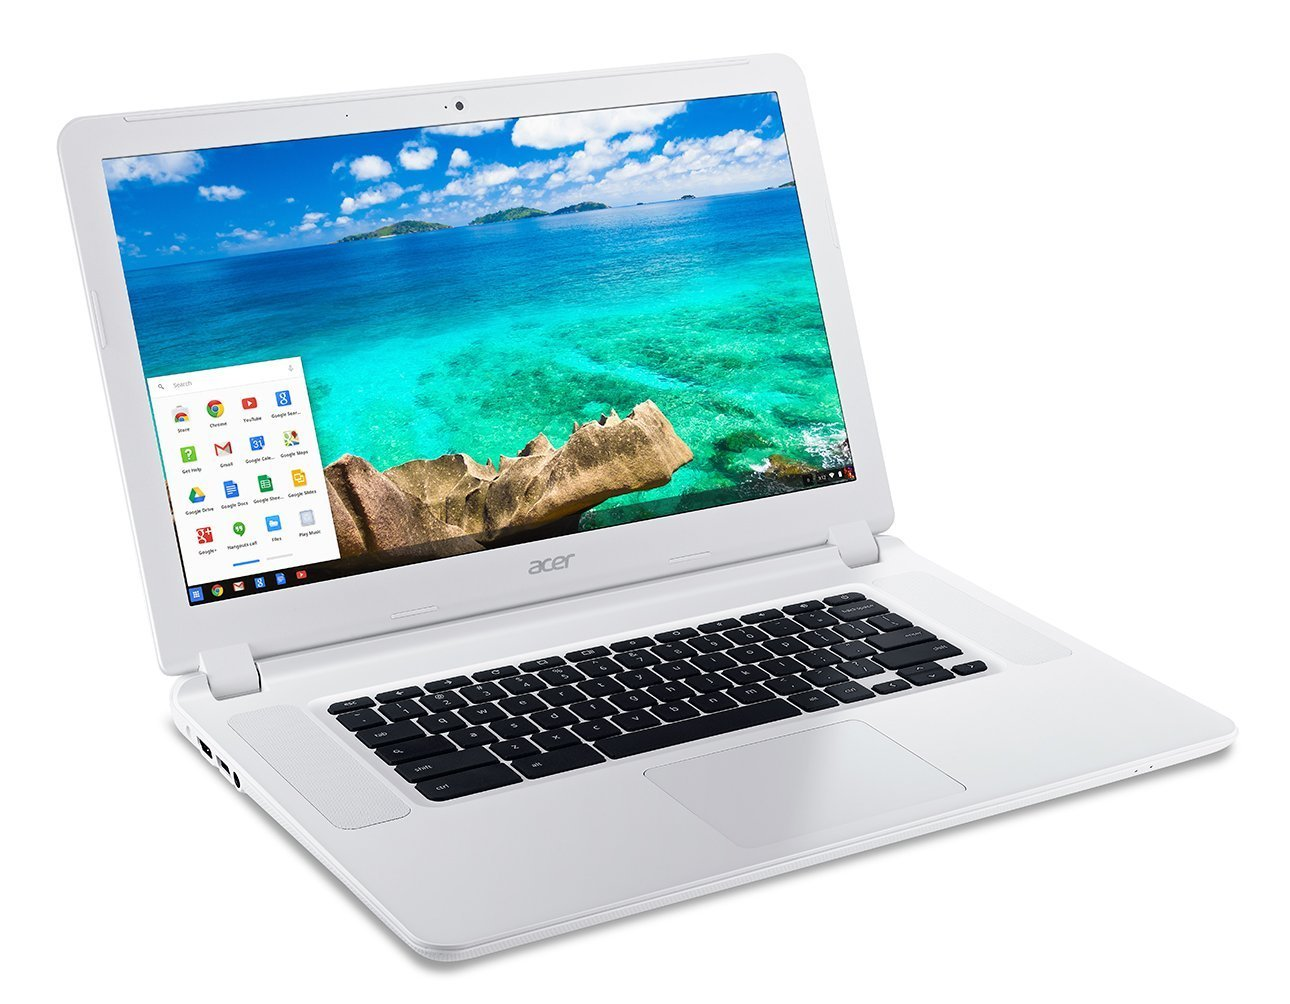 "2018 Newest Acer 15.6"" Full HD IPS Chromebook with 3x Faster WiFi , Intel Celeron Dual Core 3205U, 4GB RAM, 16GB SSD, HDMI, Webcam, Bluetooth, 9-Hours Battery, Chrome OS"